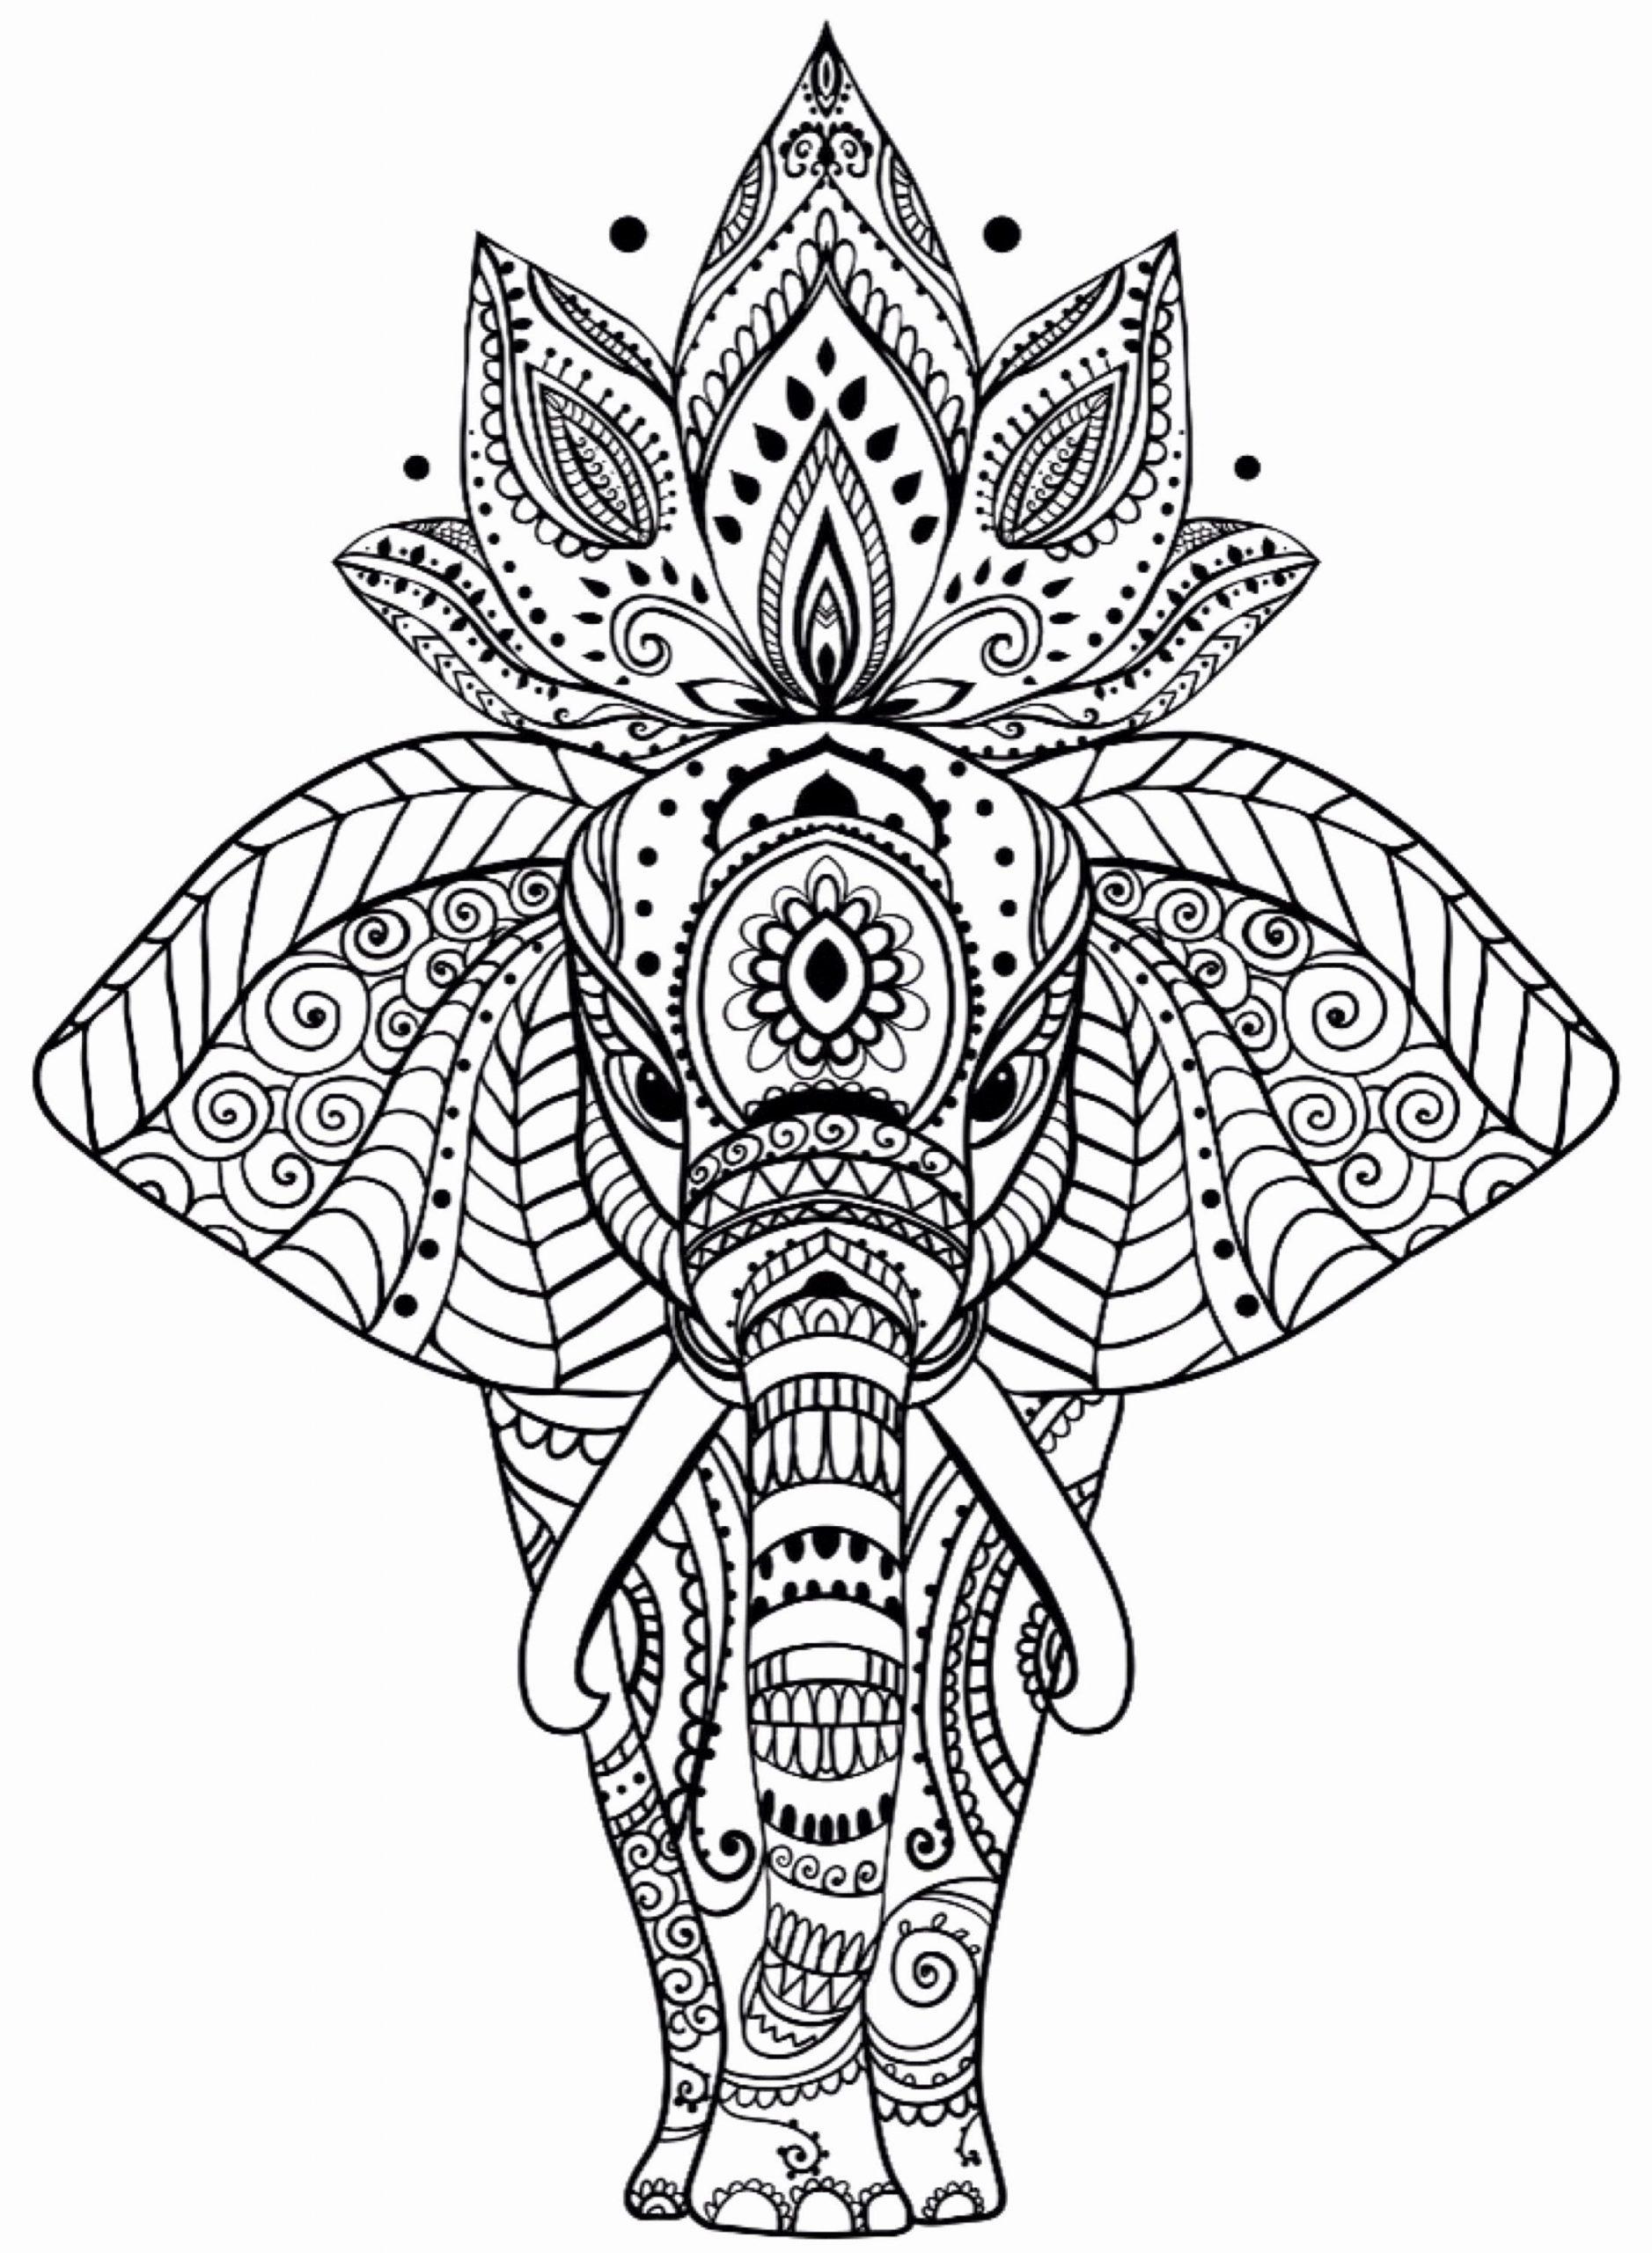 Elefant Mandala Malvorlagen Awesome Animal Mandala ganzes Tier Mandalas